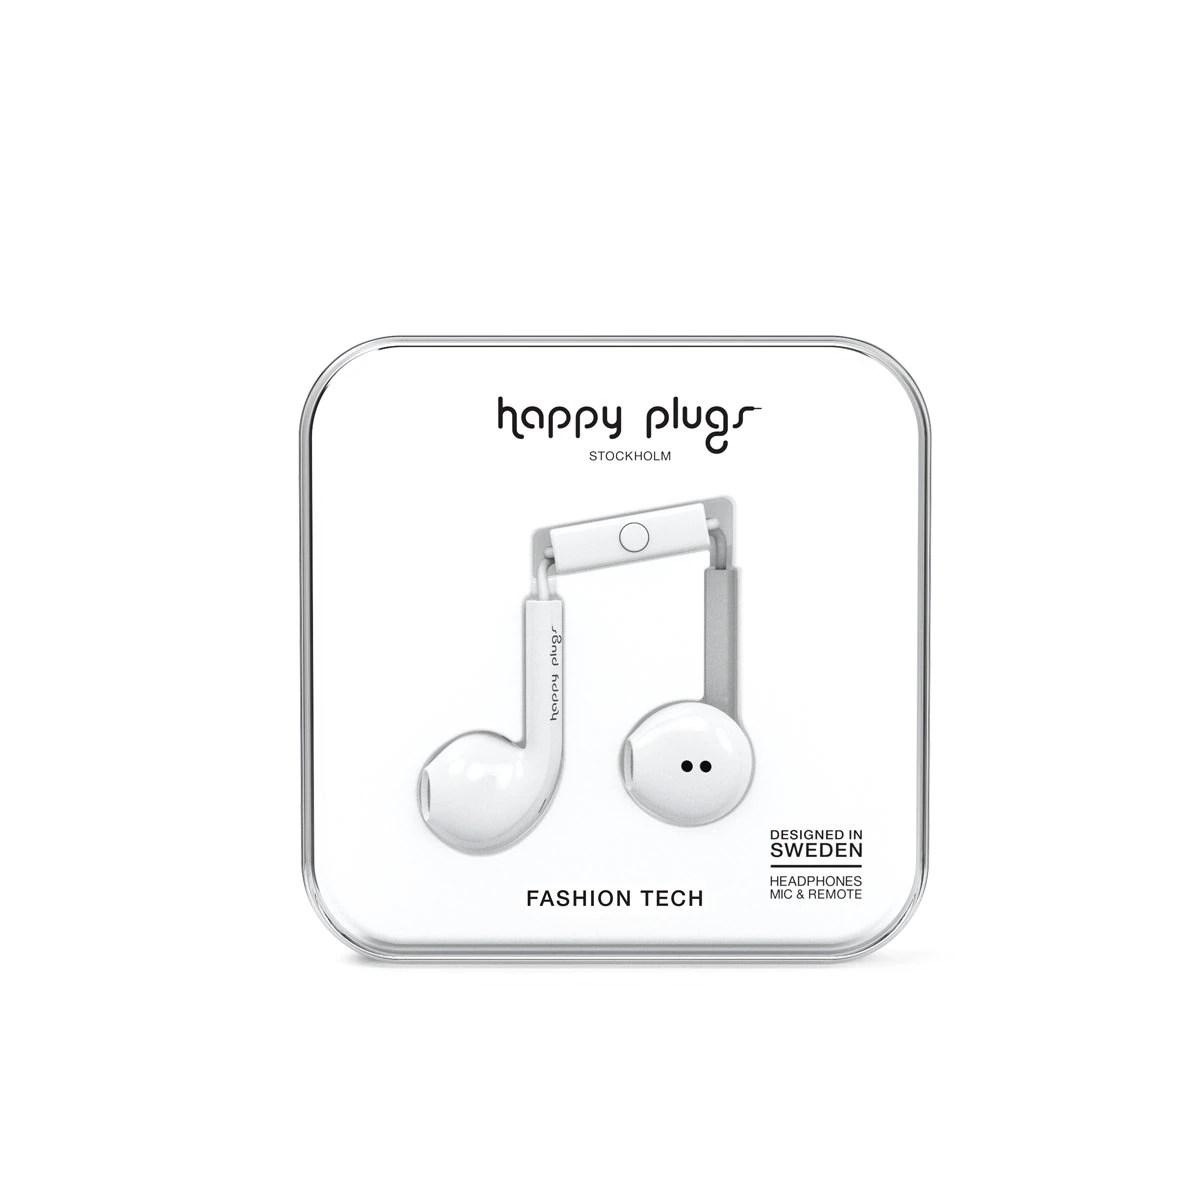 Audifonos C Microfono Earbud Plus Blanco Happy Plugs